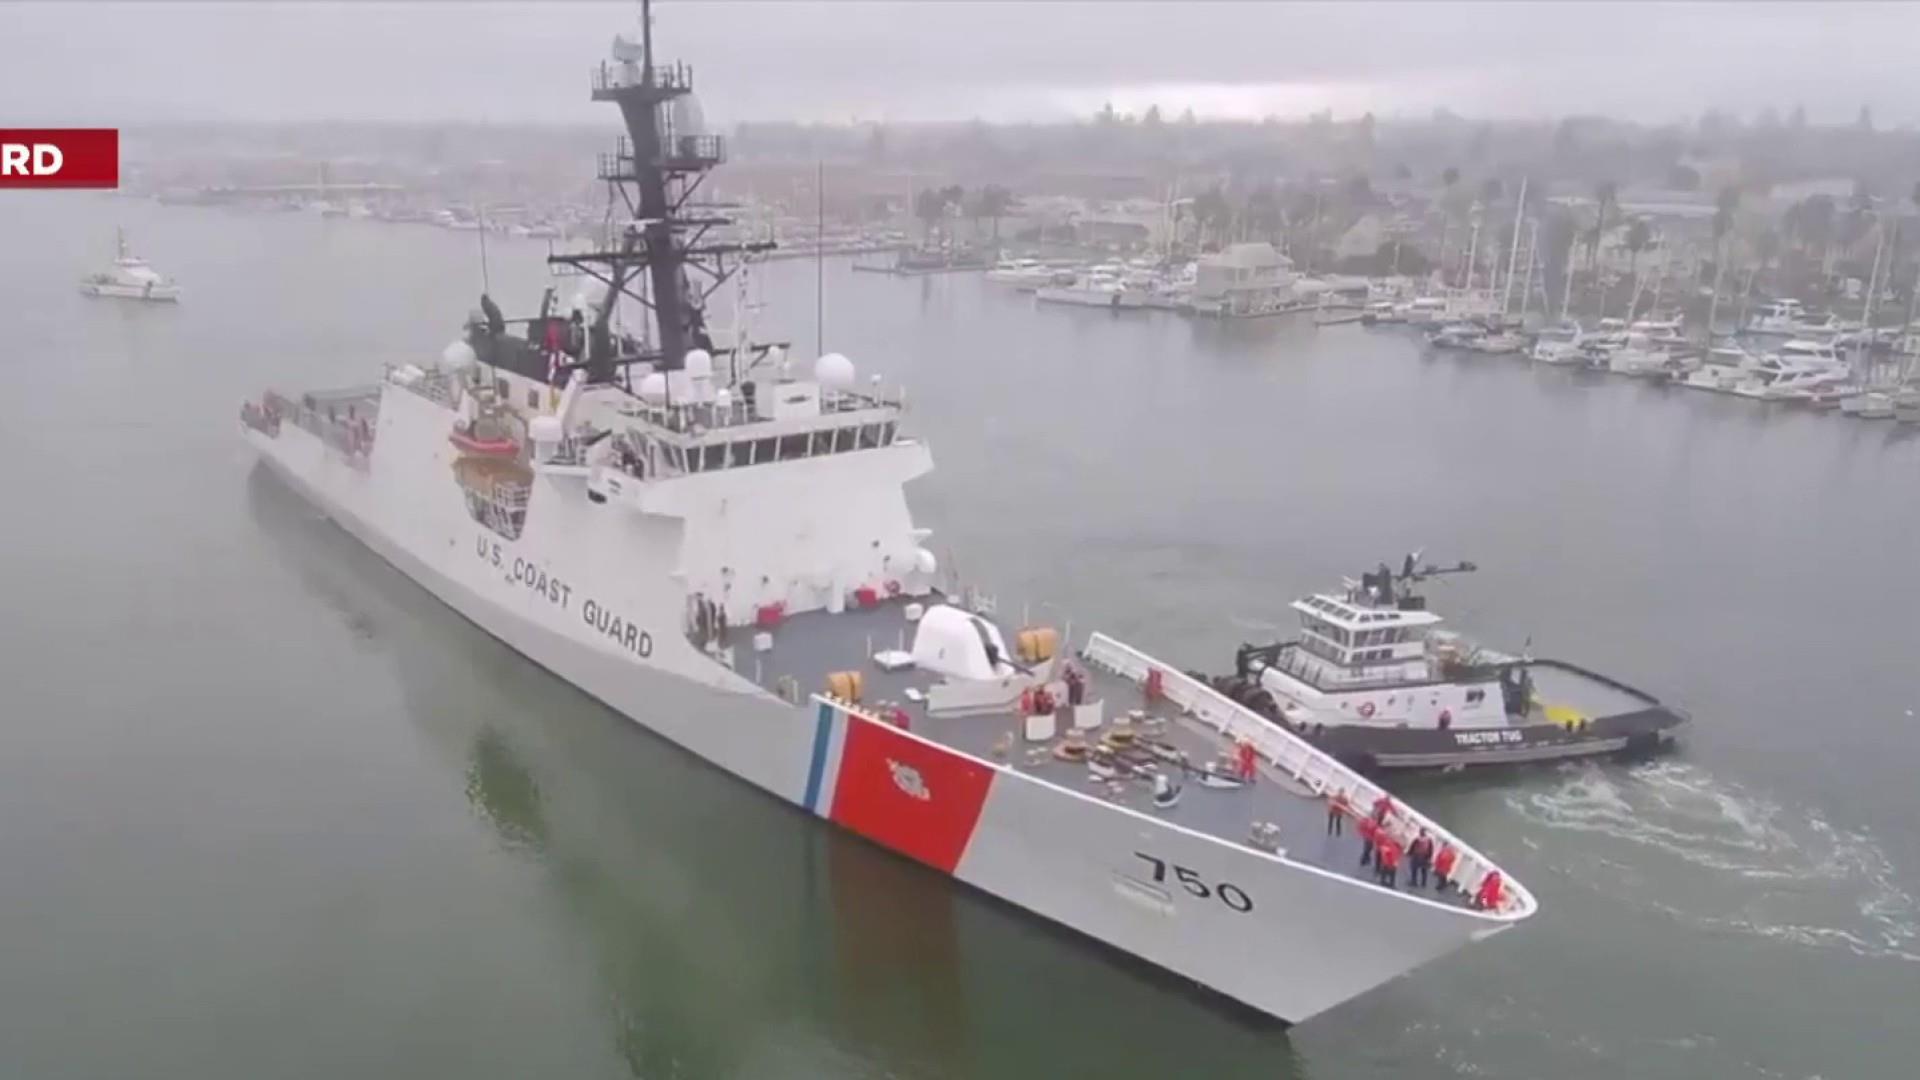 The U.S. Coast Guard is suffering from the shutdown